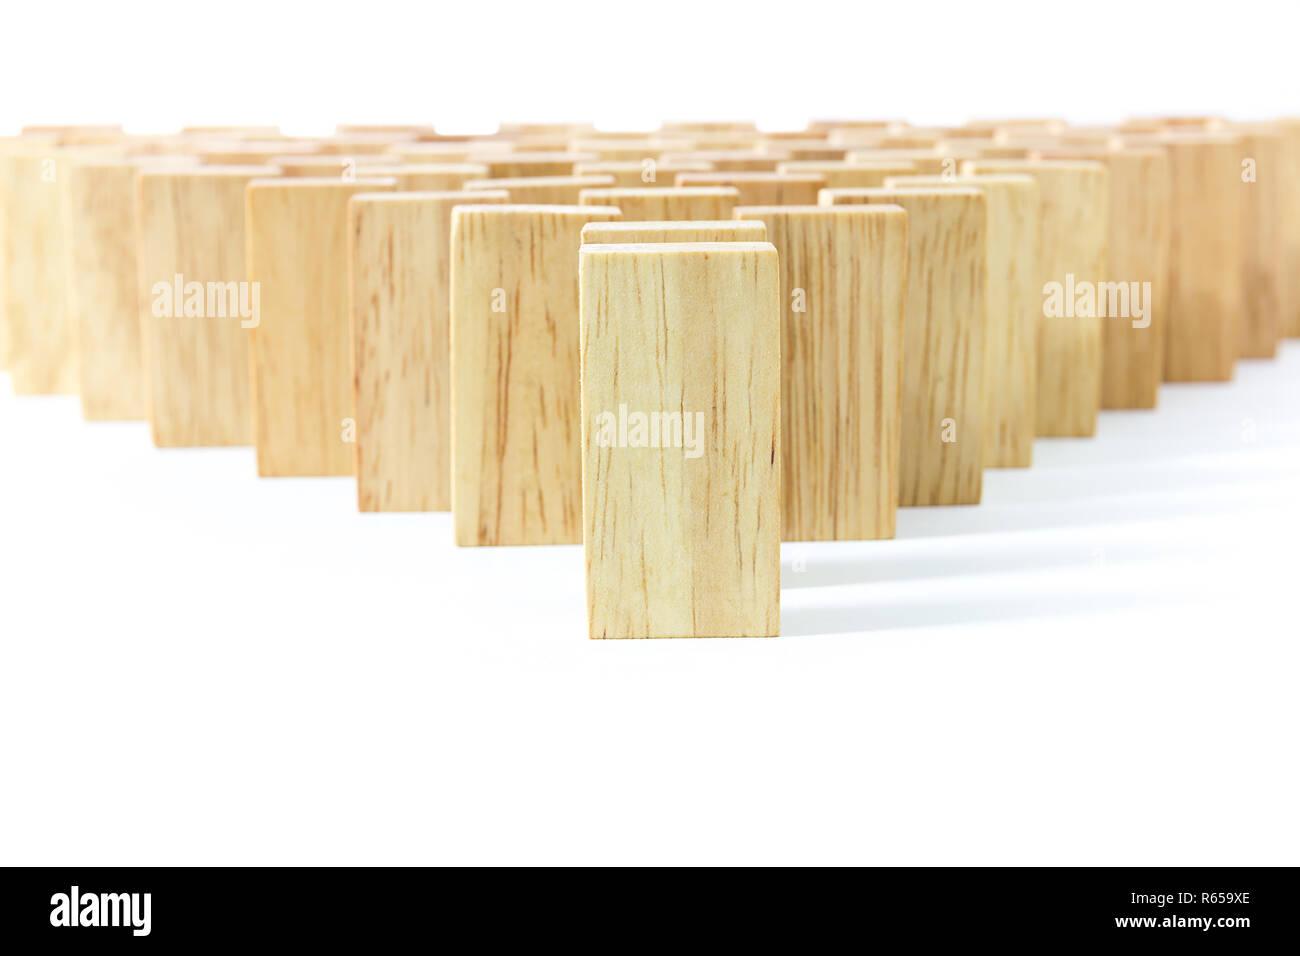 Row wooden domino - Stock Image